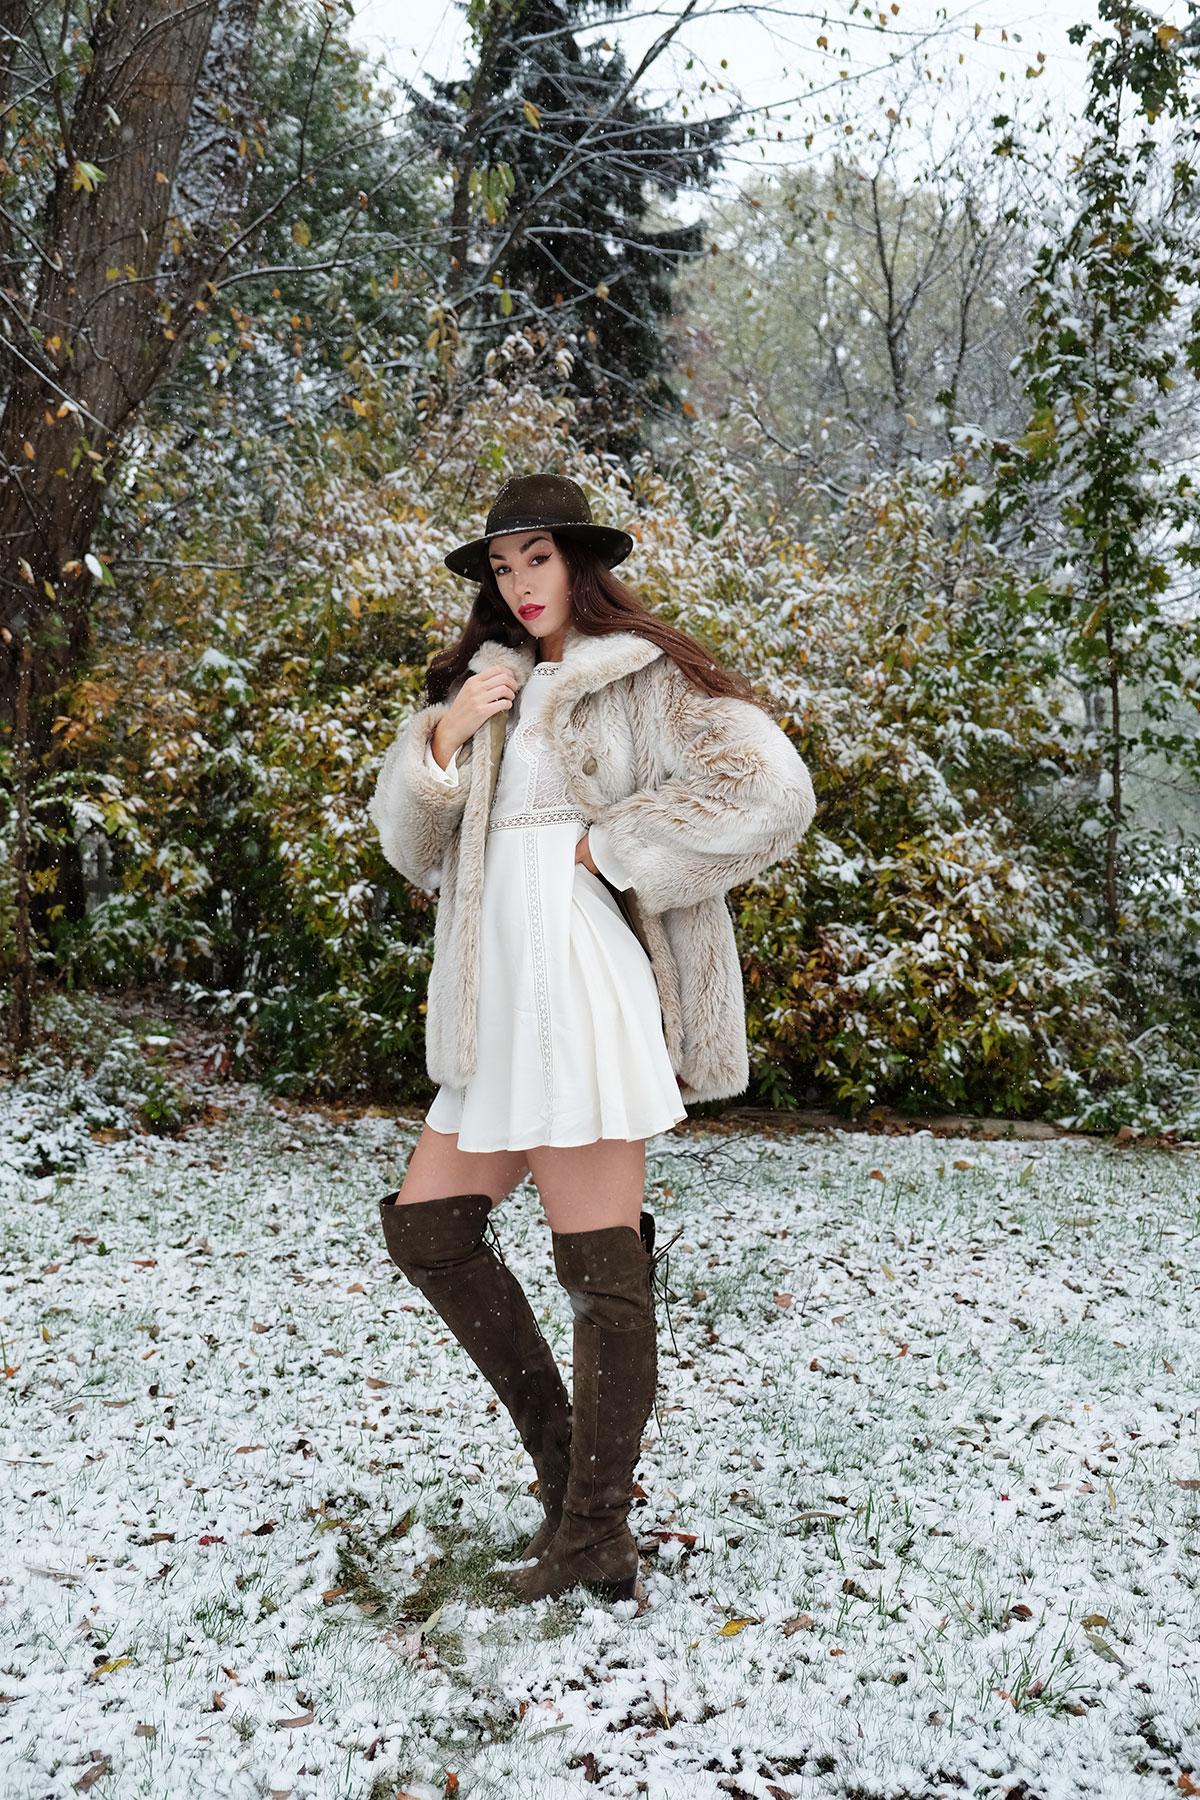 snow_1_sml.jpg